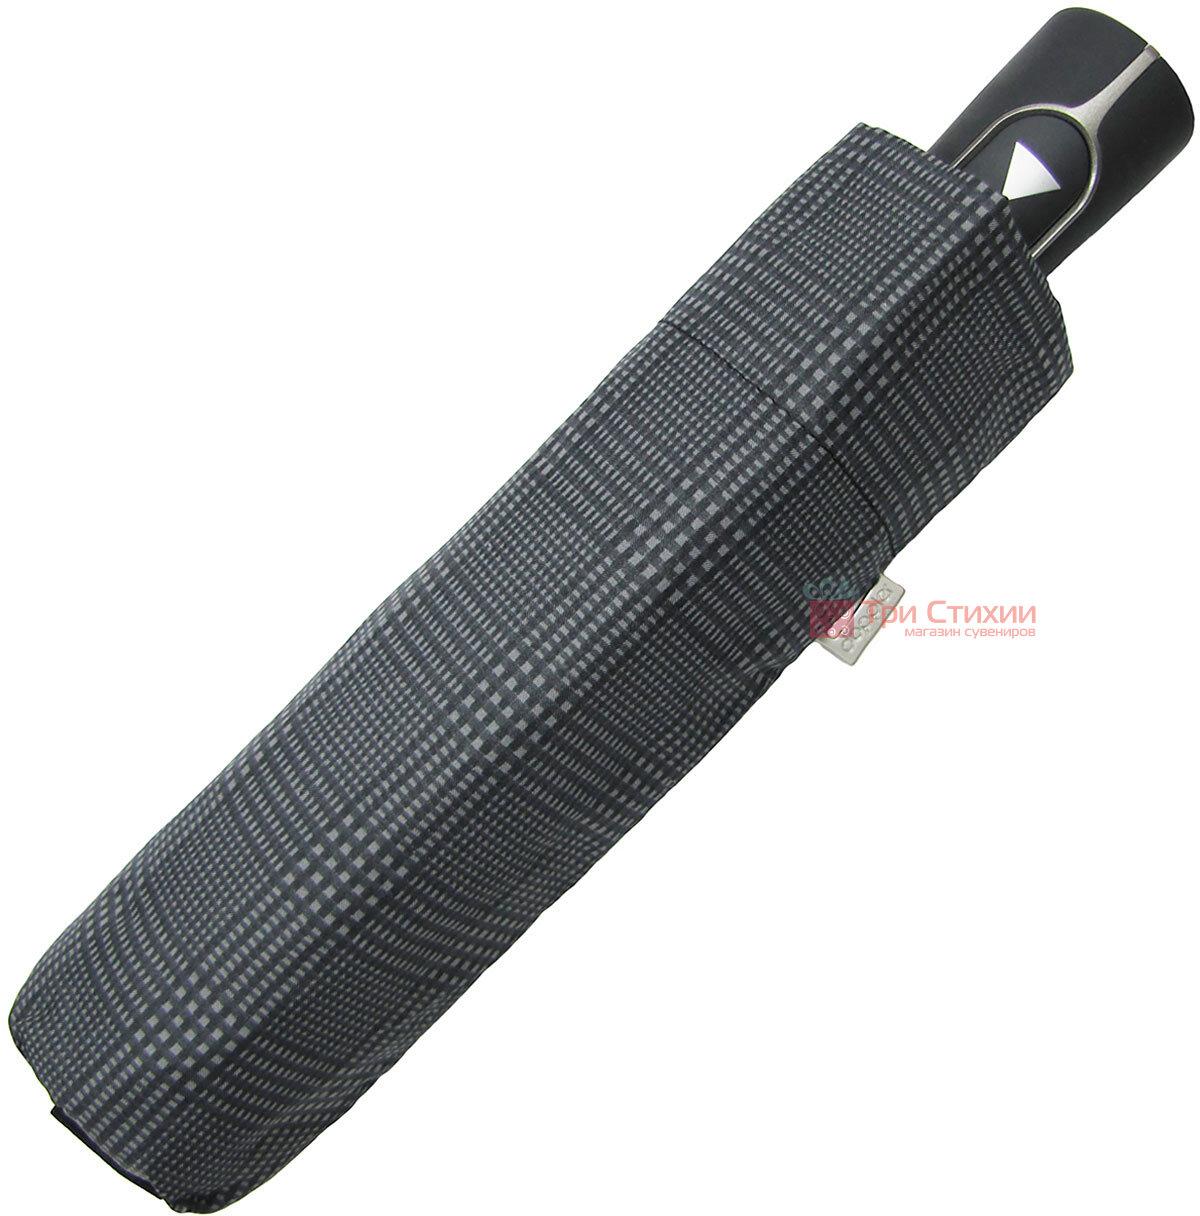 Парасоля складана Doppler Carbon 730167-1 напівавтомат Велика клітинка, фото 4